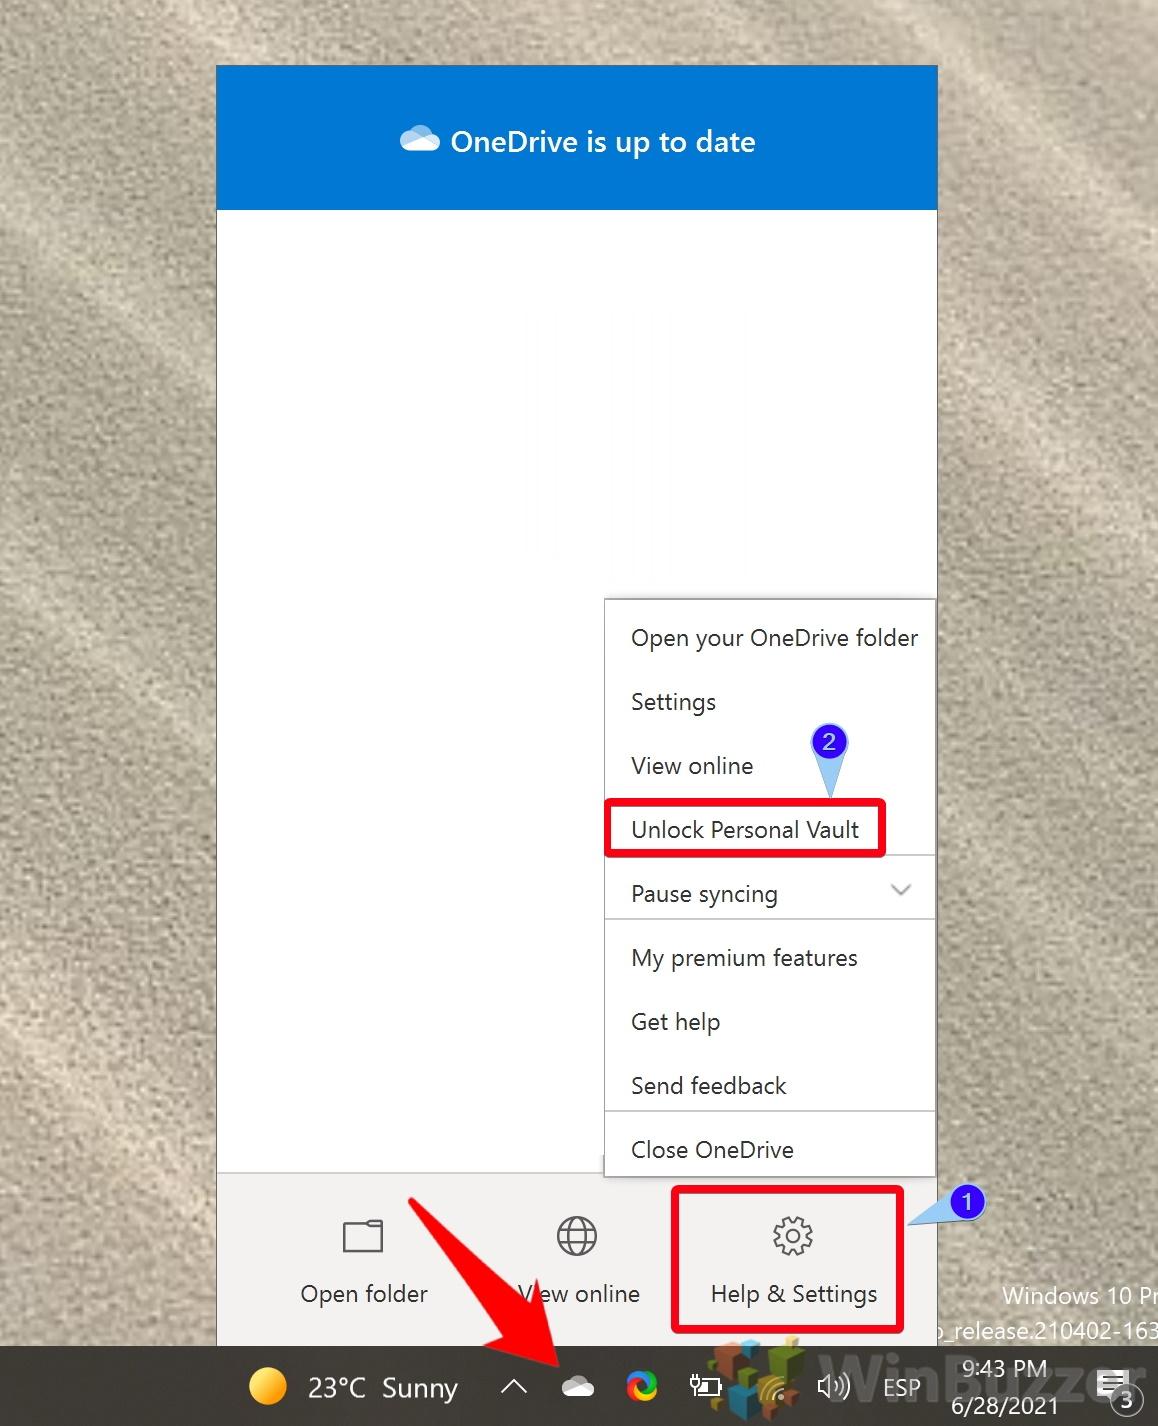 Windows 10 - OneDrive - Help & Settings - Unlock Personal Vault Option 1